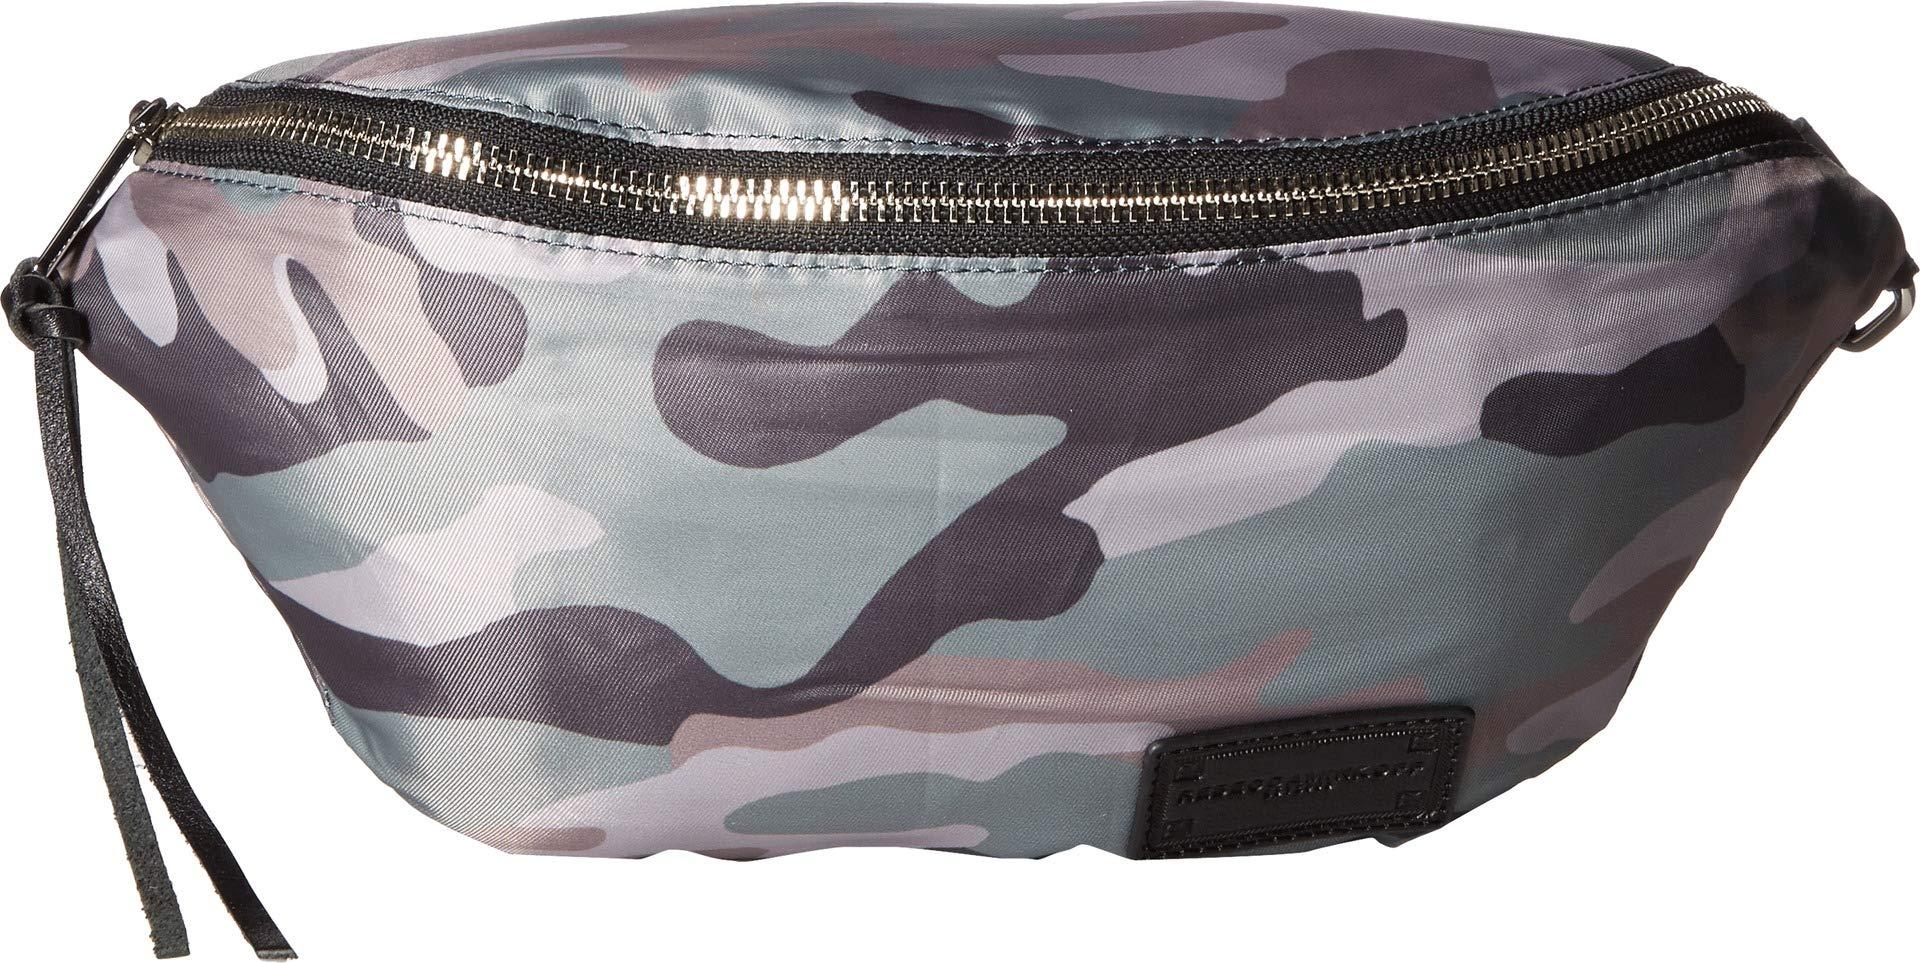 Rebecca Minkoff Women's Nylon Belt Bag, Camo Print, One Size